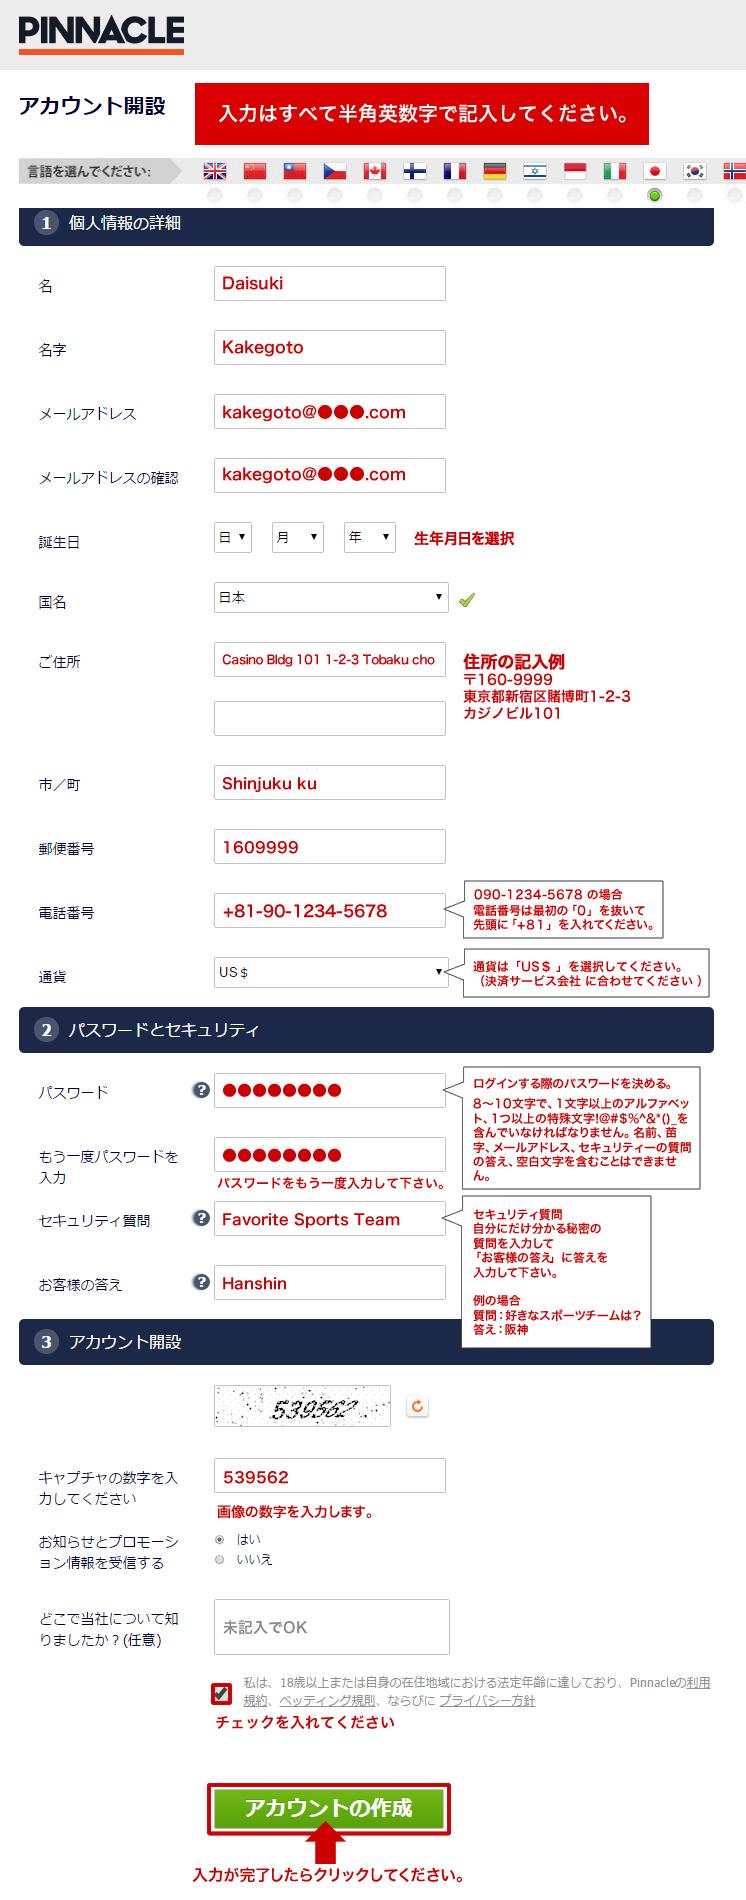 Pinnacle Sports(ピナクルスポーツ)登録方法